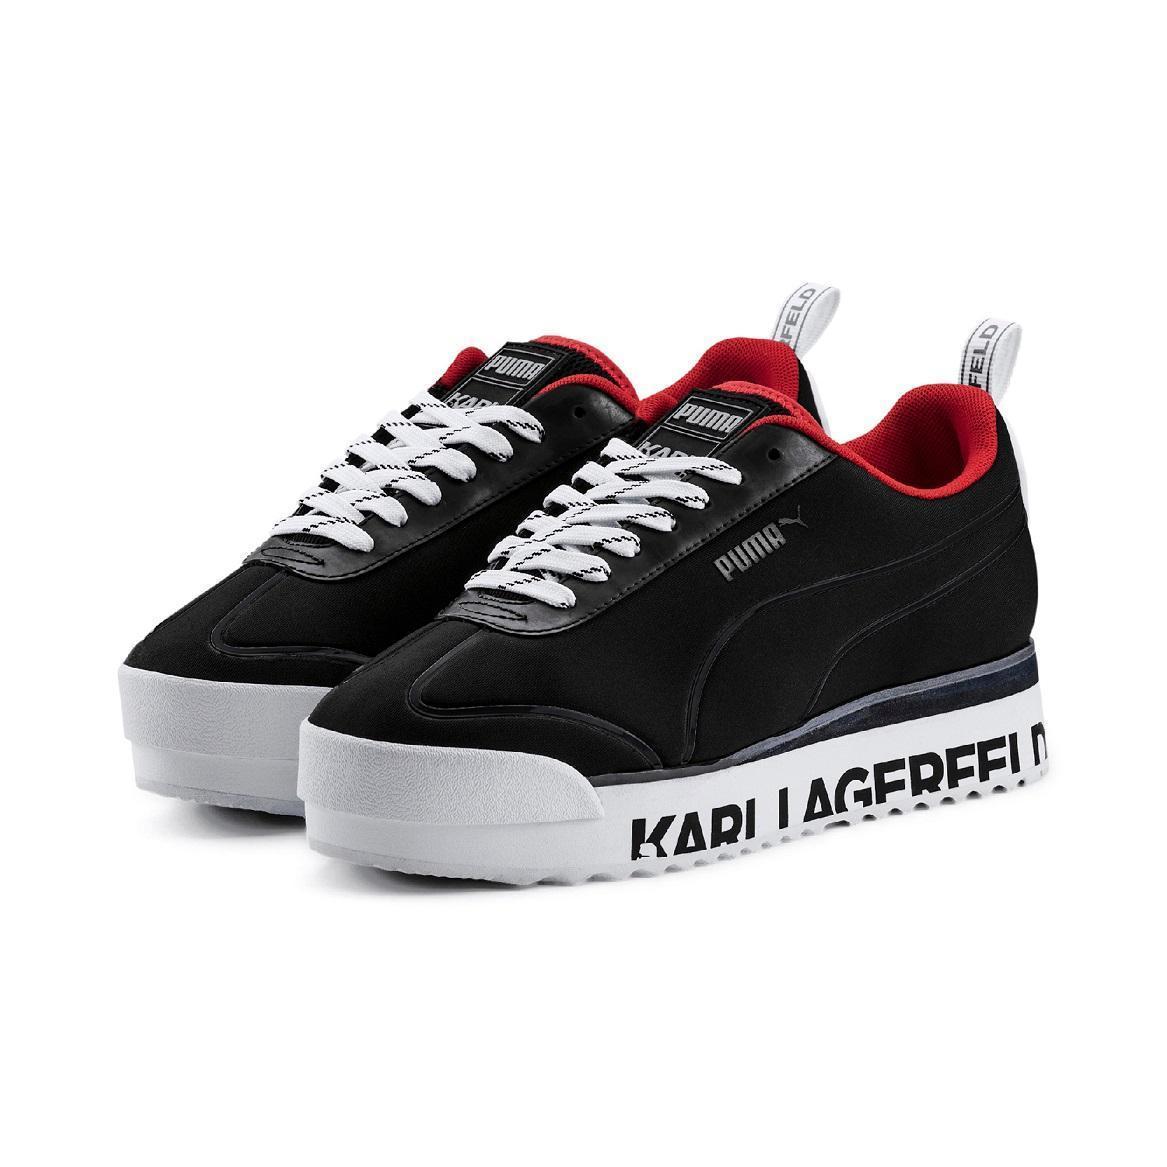 PUMA SELECT x KARL LAGERFELD聯名系列ROMA ARMOR KARL鞋款,NT$4,580。(PUMA提供)